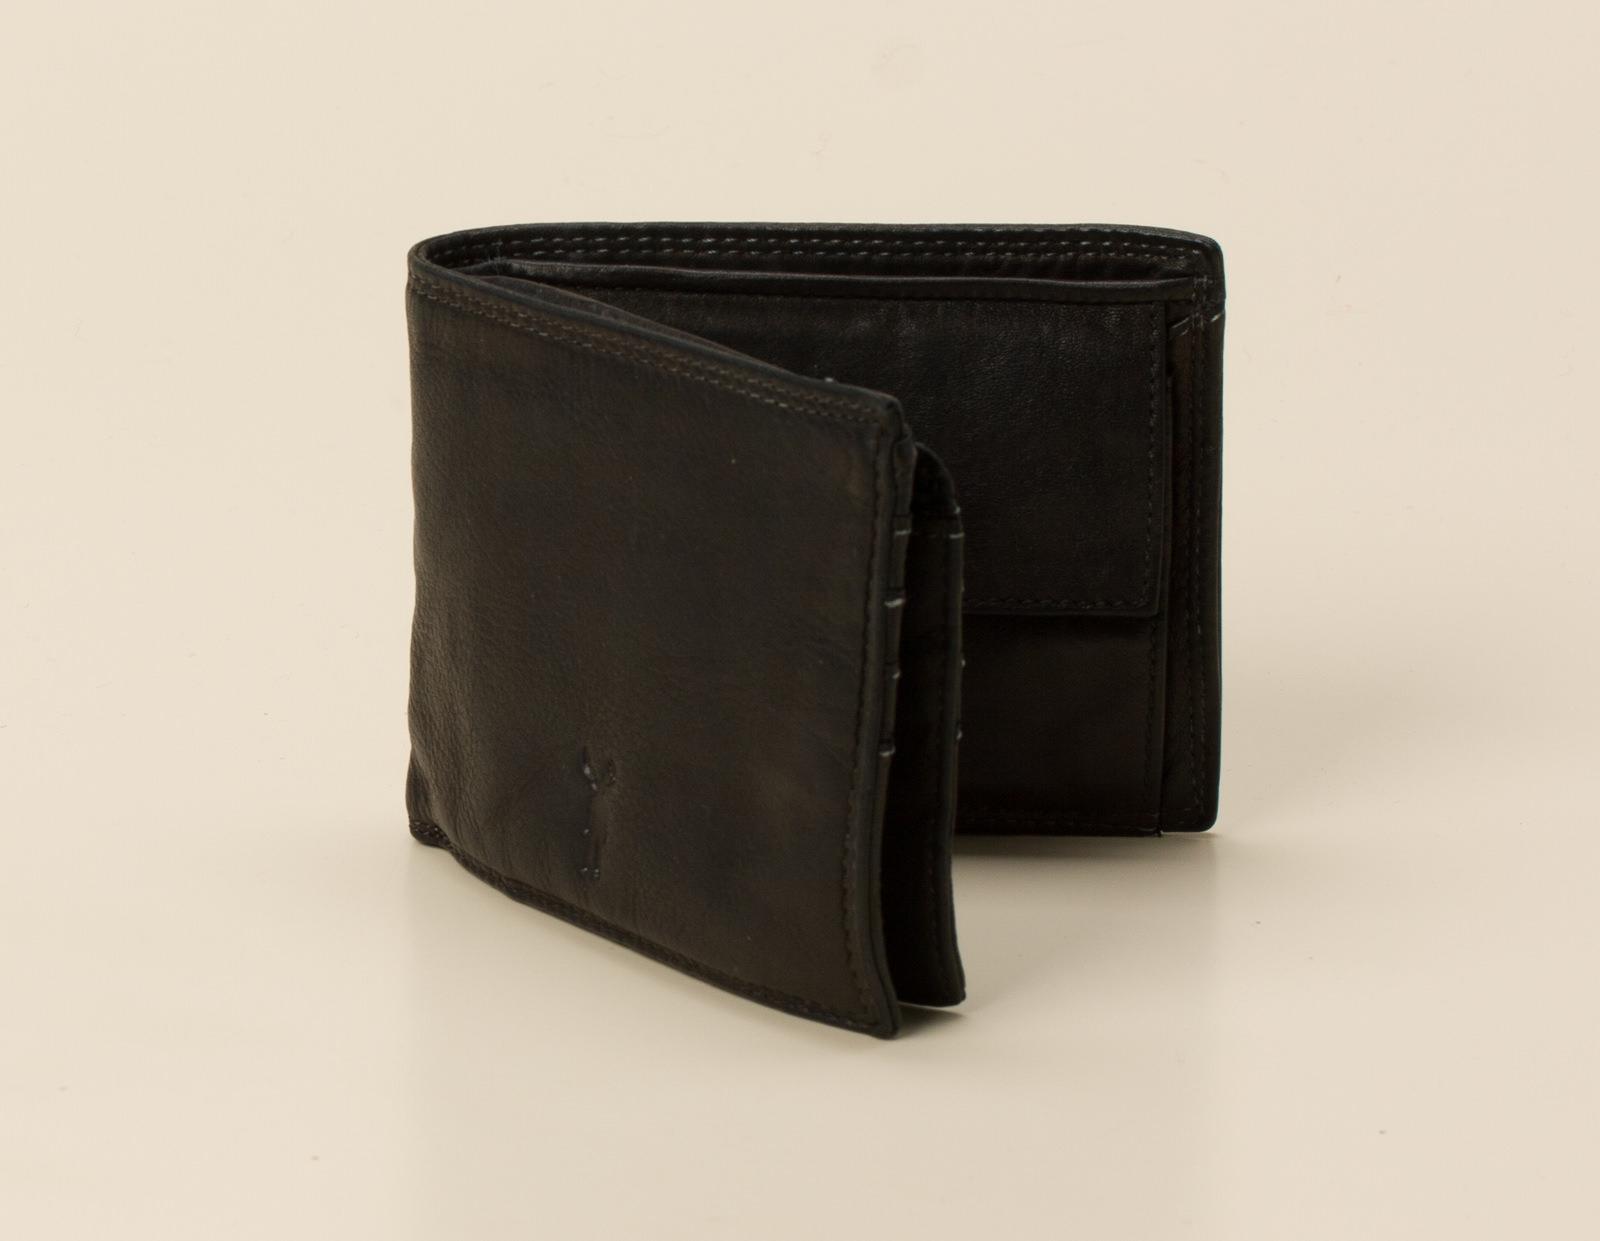 2214e6f5ad1b1 Jack Kinsky Herren-Acces. Portemonnaie in schwarz kaufen